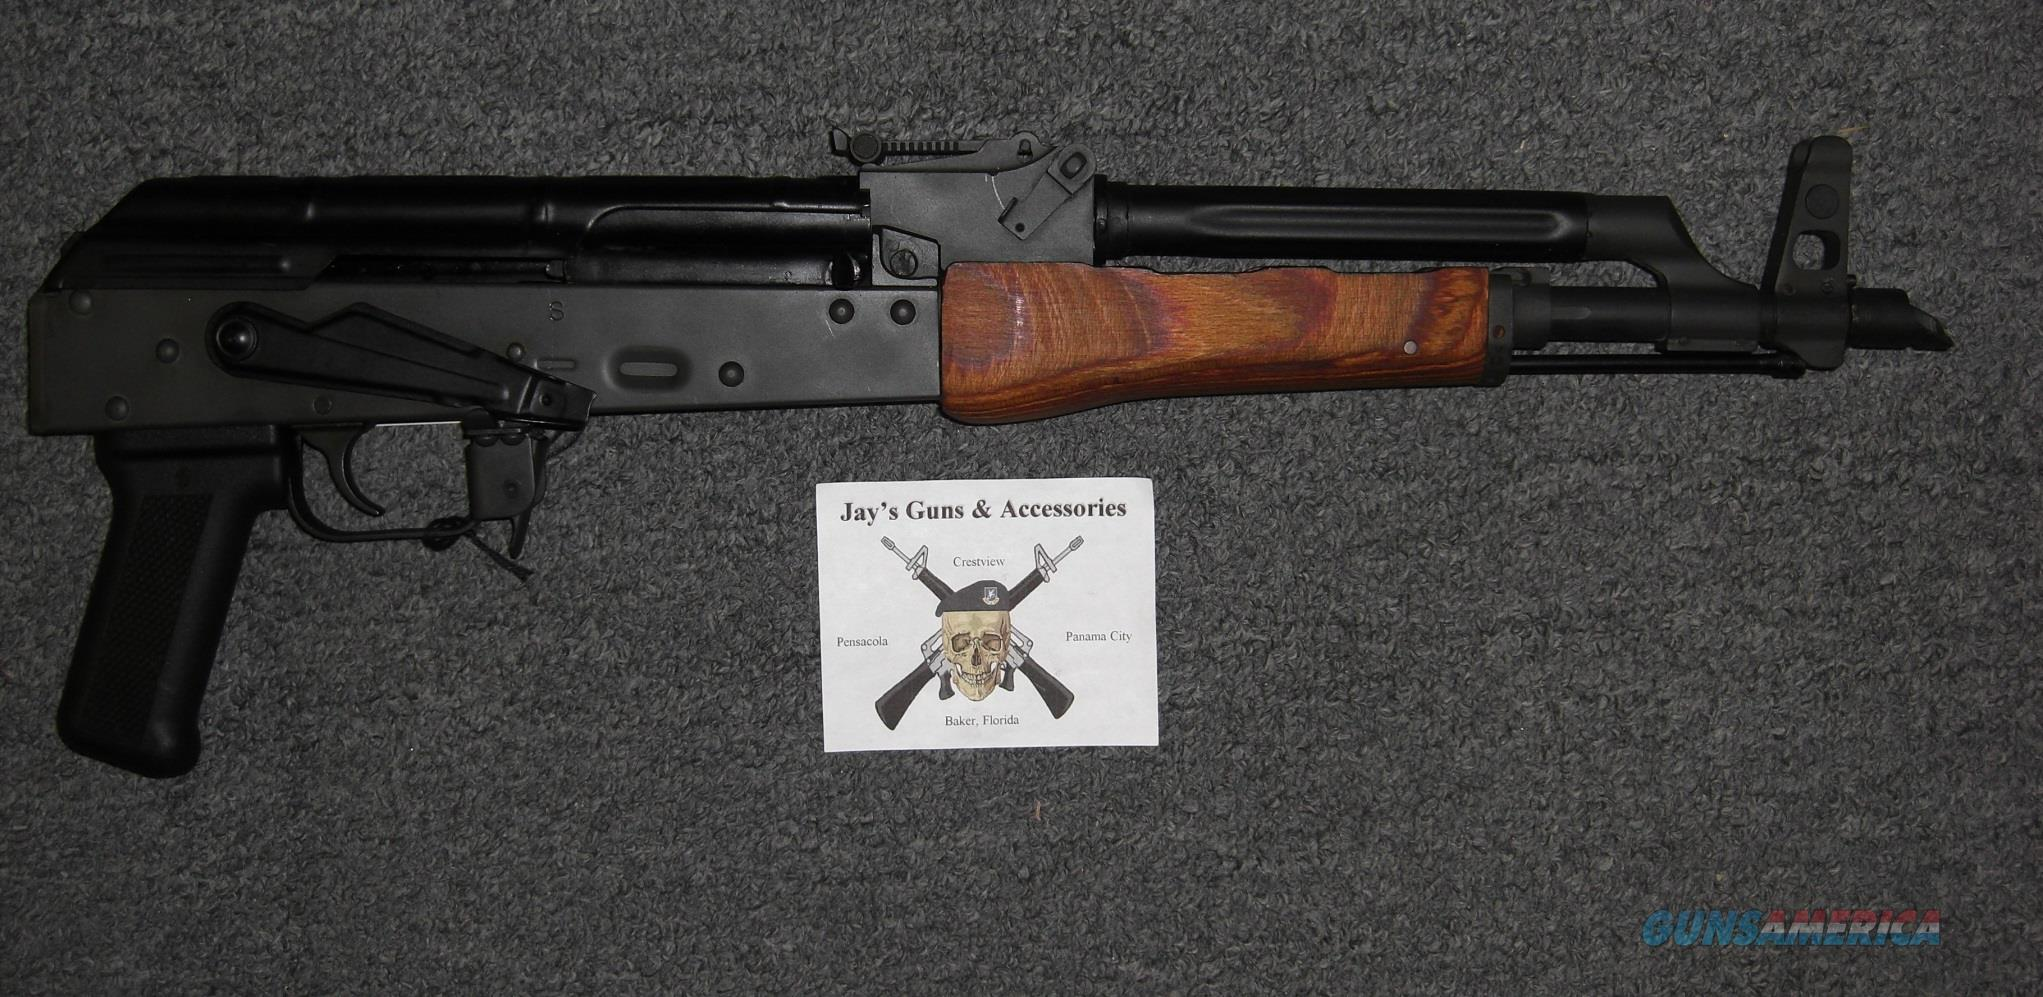 Century International Arms AK Pistol  Guns > Pistols > Century International Arms - Pistols > Pistols